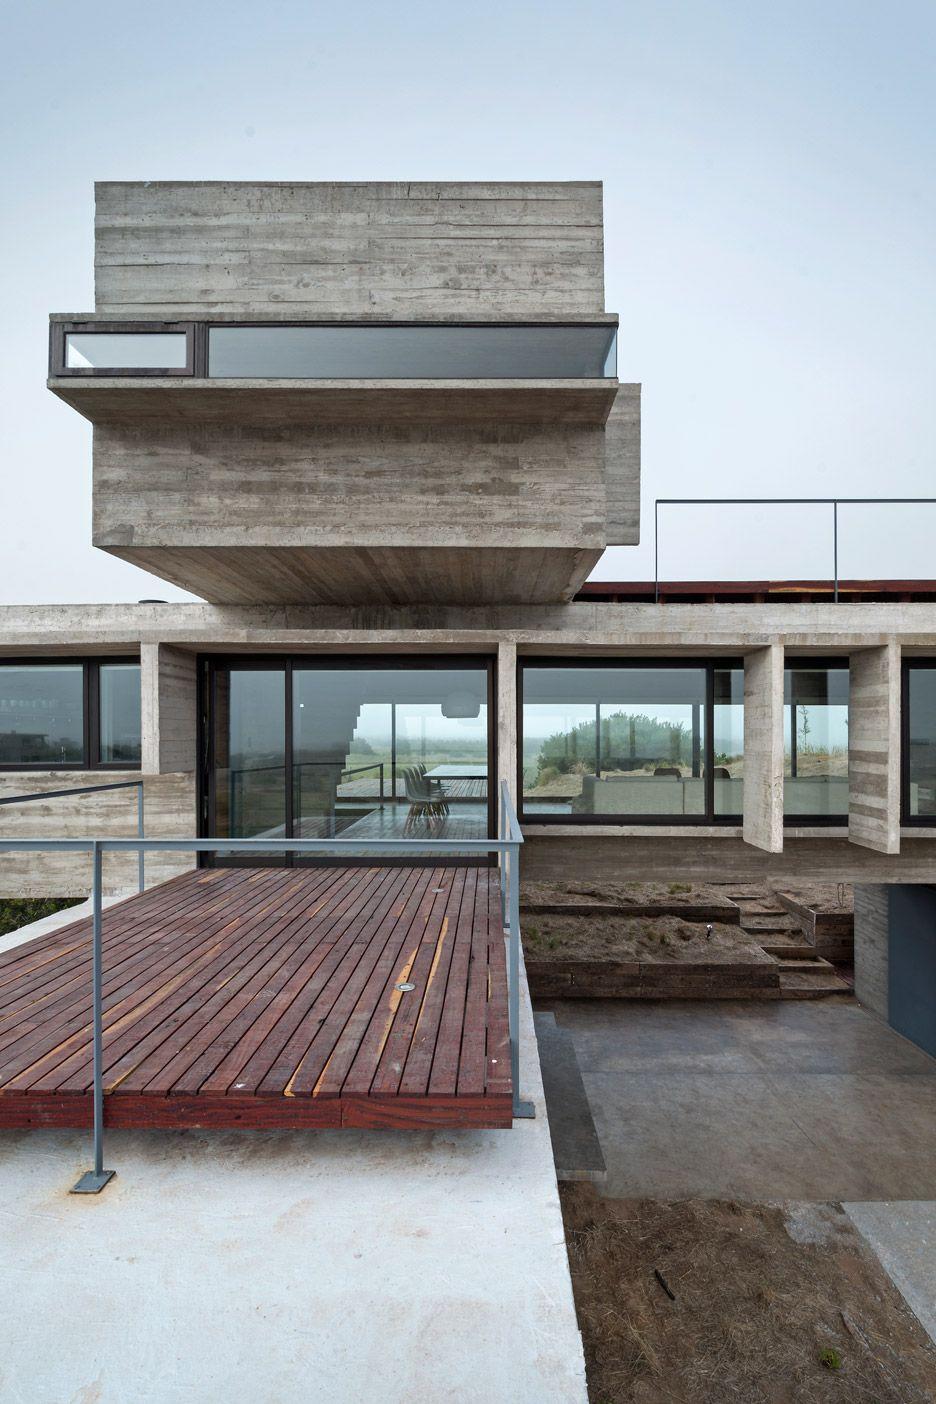 Casa Golf by Luciano Kruk comprises three